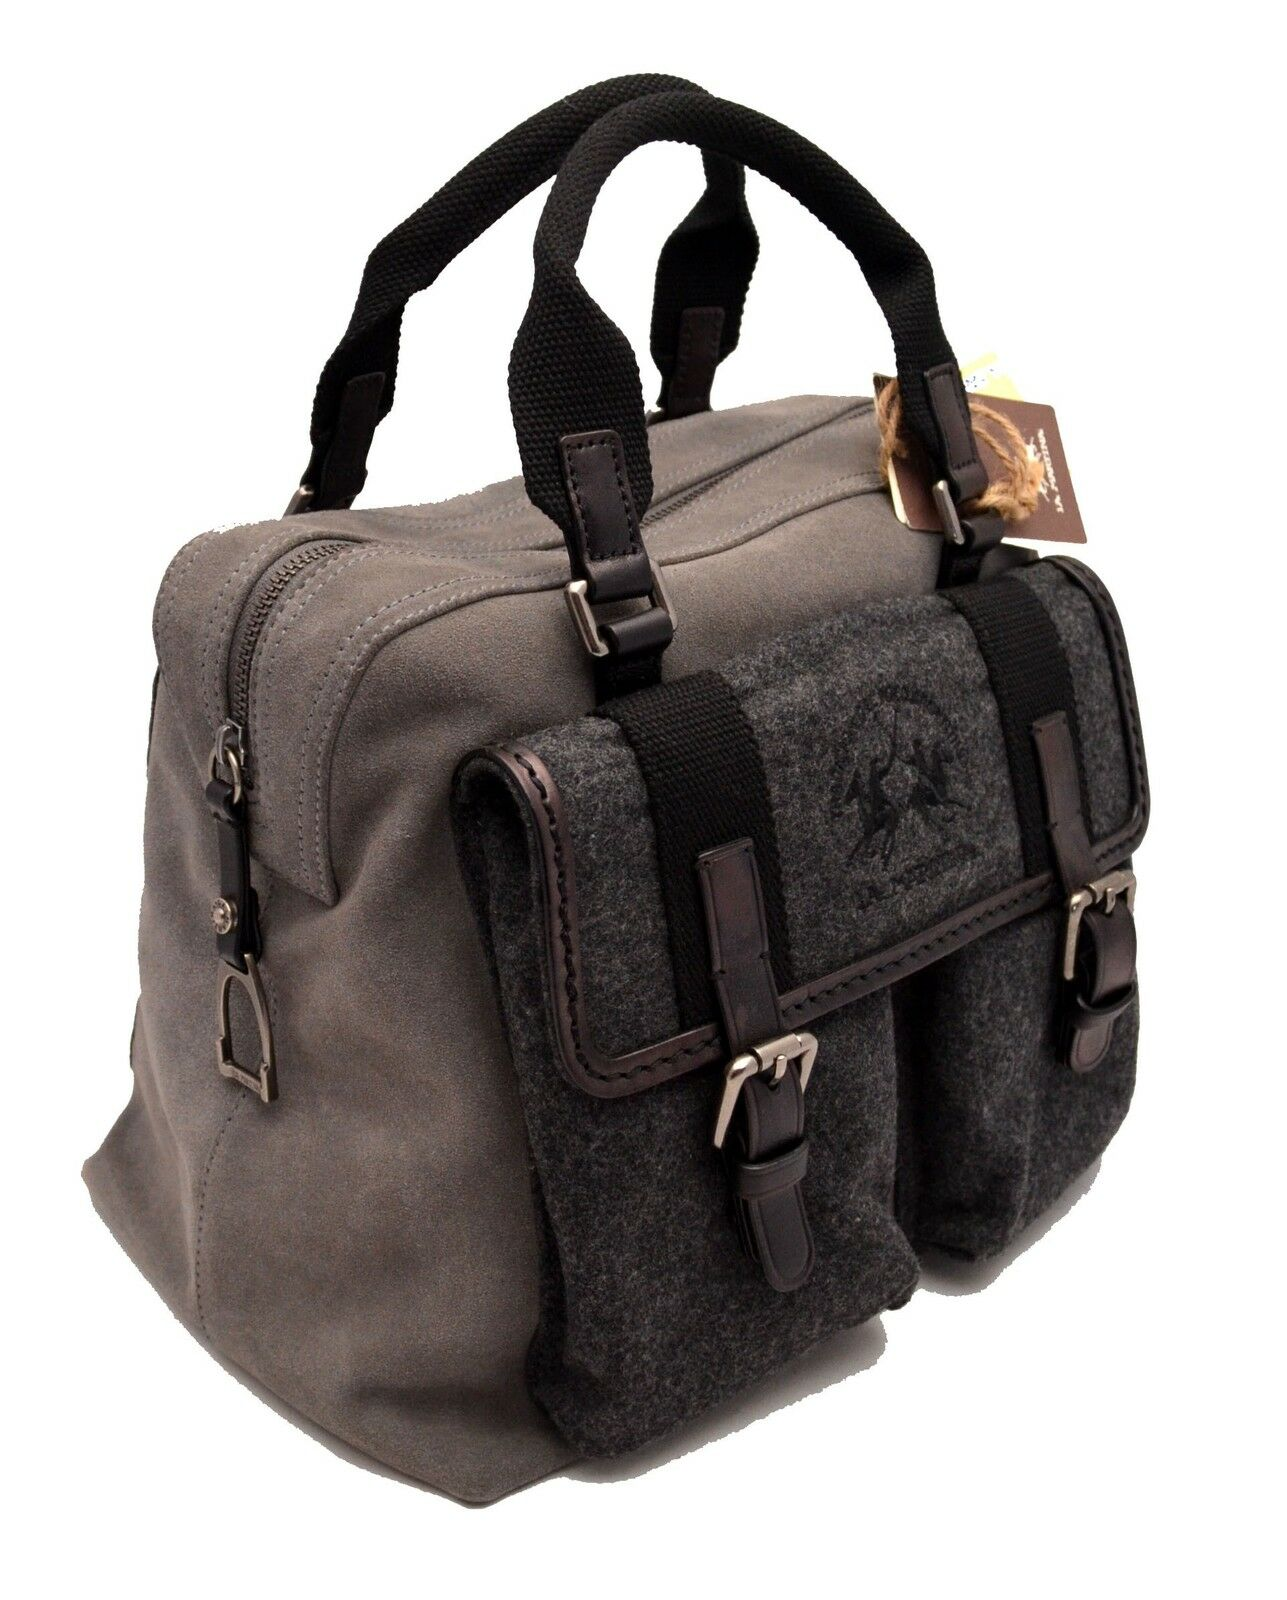 Shoulder Bag La Martina Polo Shirts Women Leather Jaramillo Grey